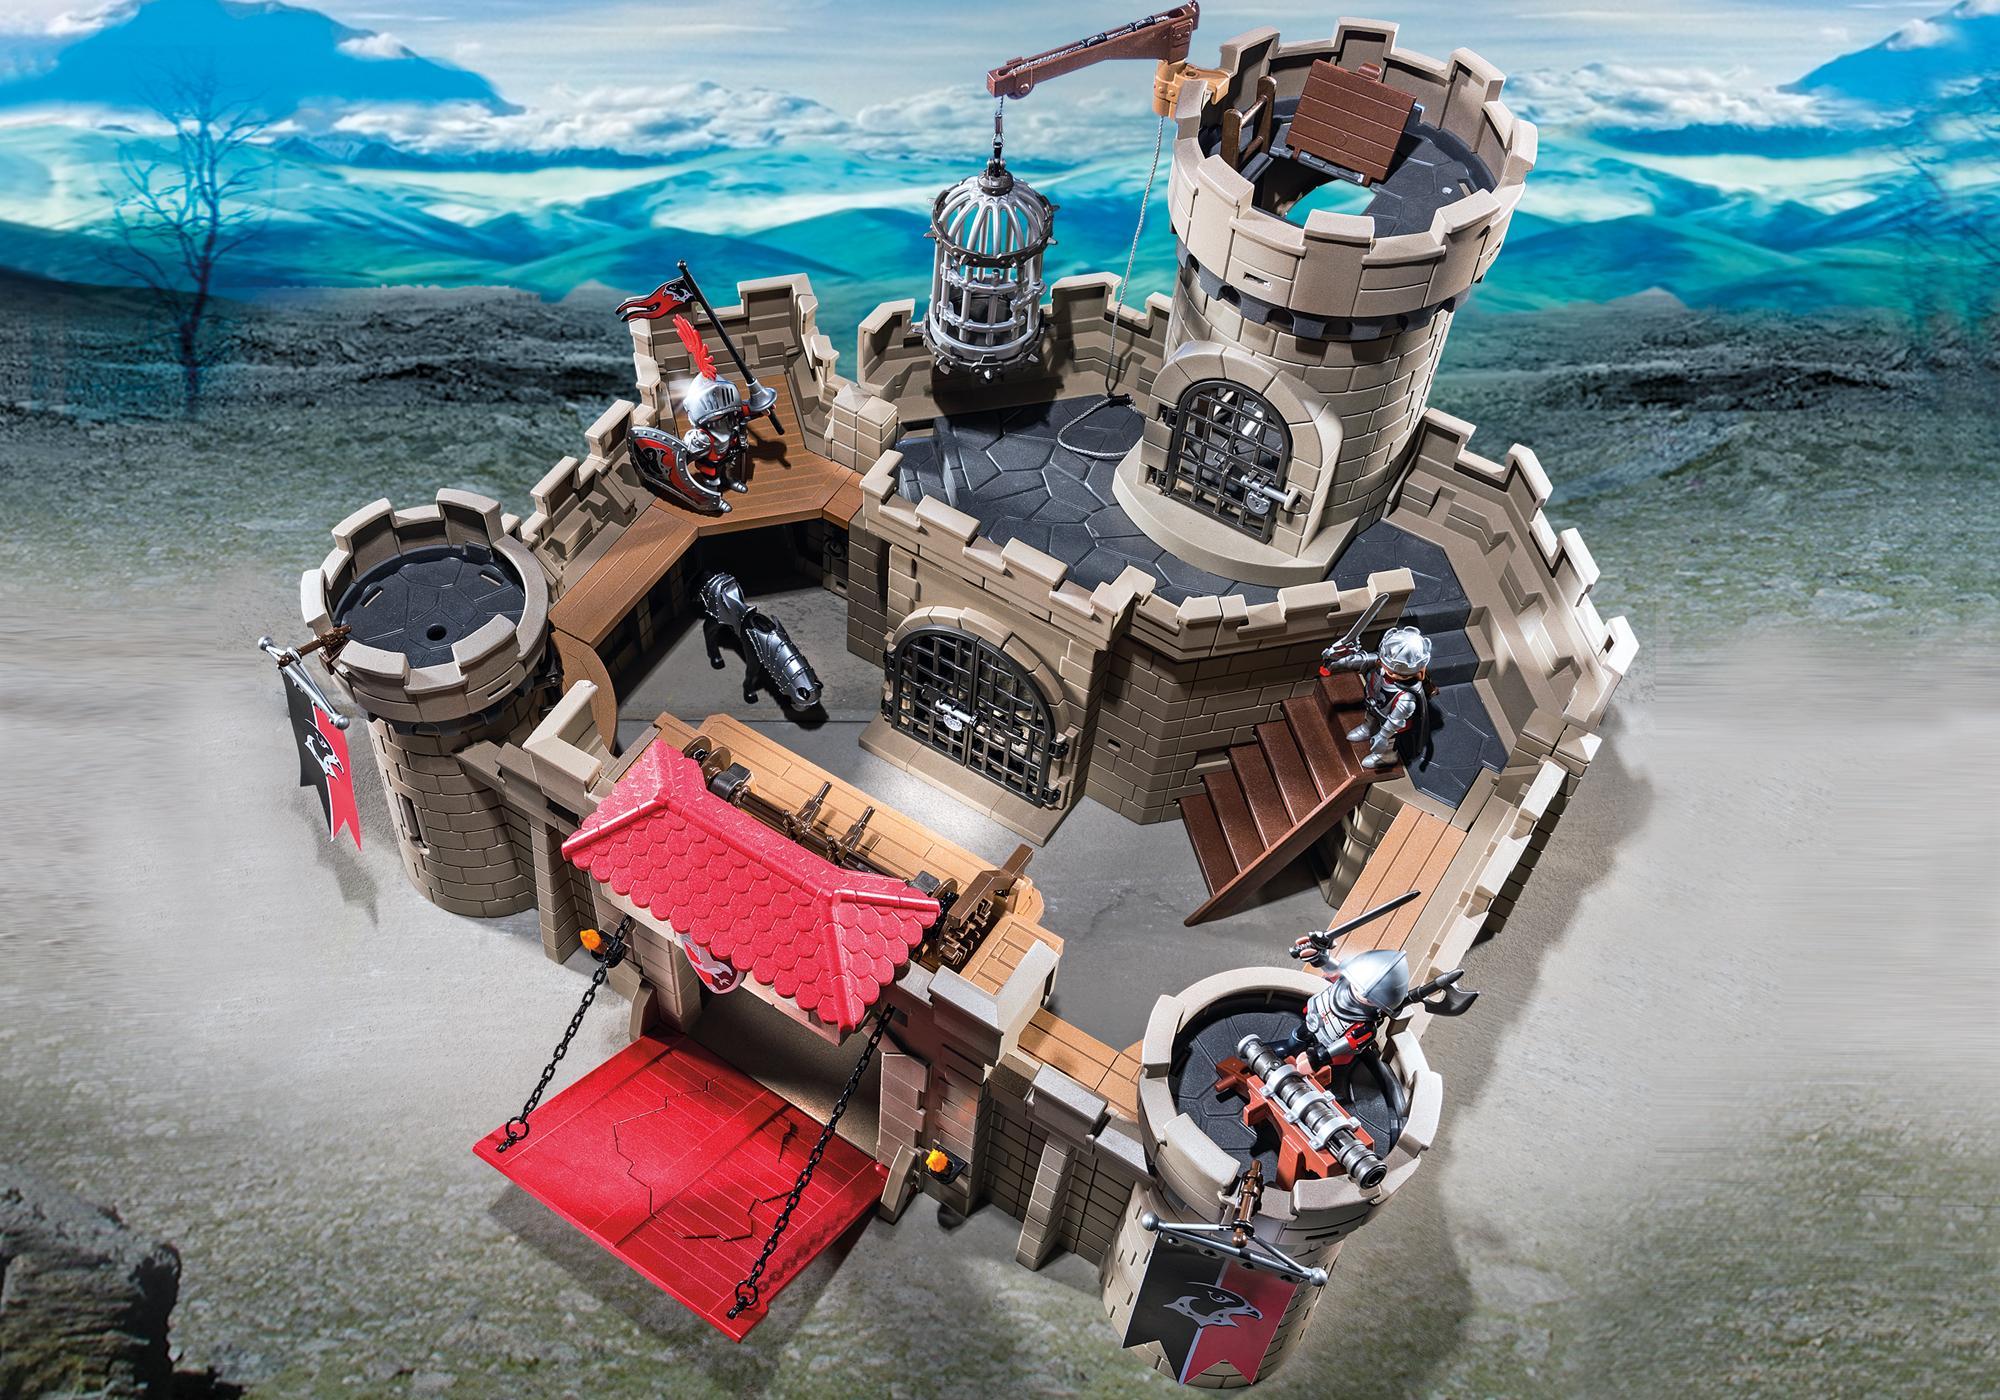 http://media.playmobil.com/i/playmobil/6001_product_extra1/Рыцари: Замок Рыцарей Ястреба